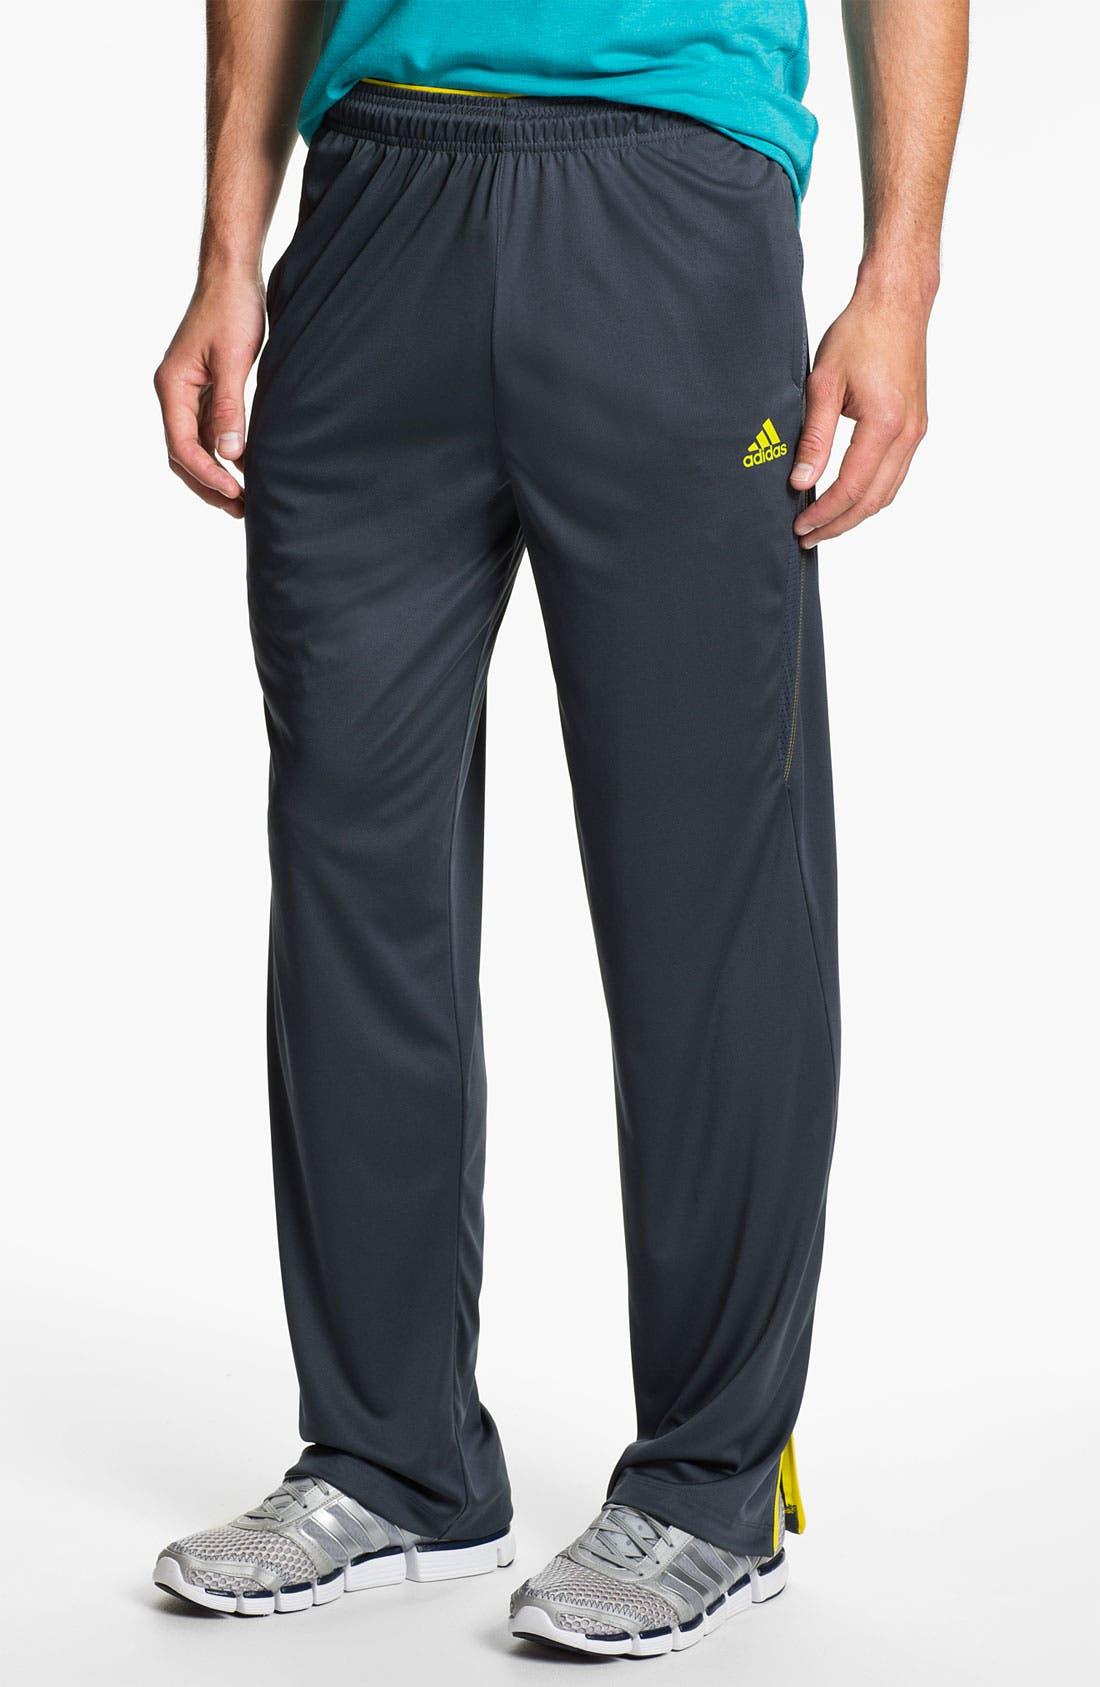 Main Image - adidas 'Climaspeed' Tapered Pants